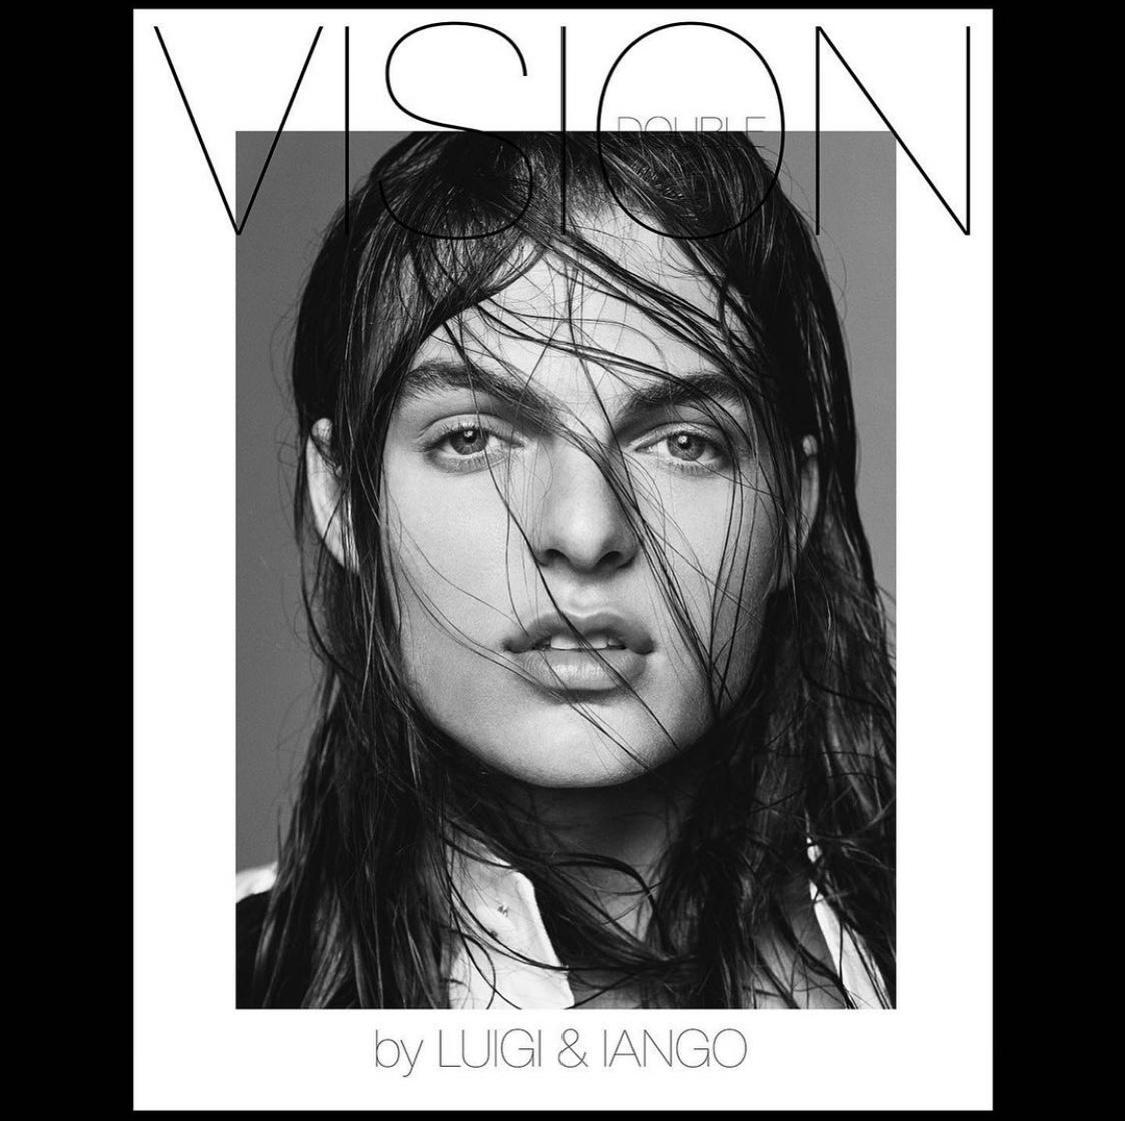 Vision w/Luigi & Iango